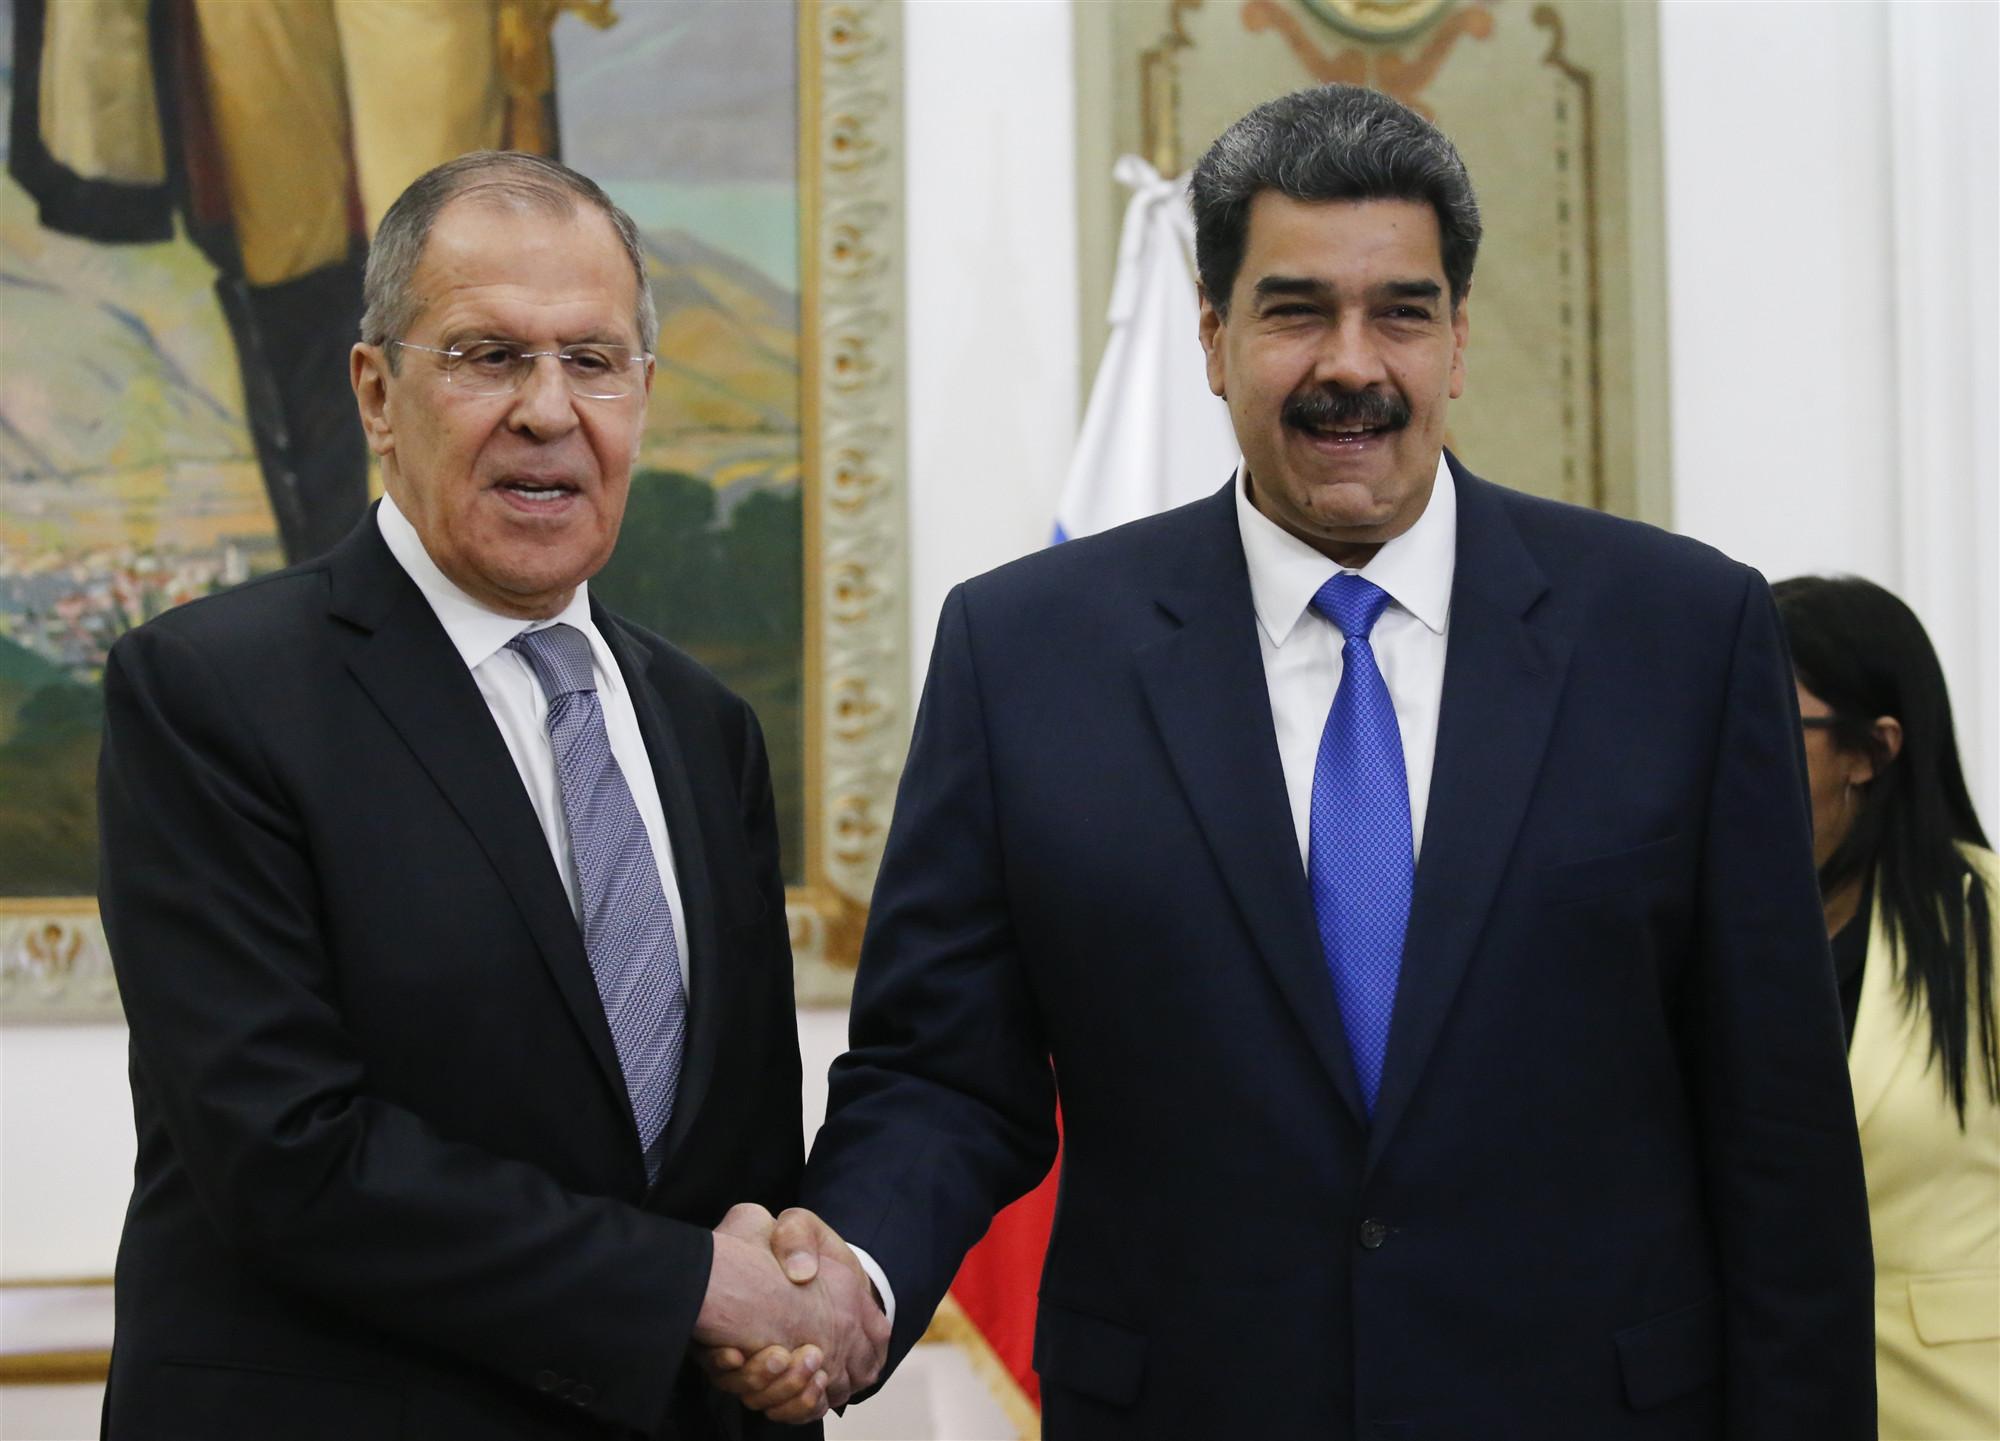 Russian FM slams US sanctions on Venezuela as 'illegal'